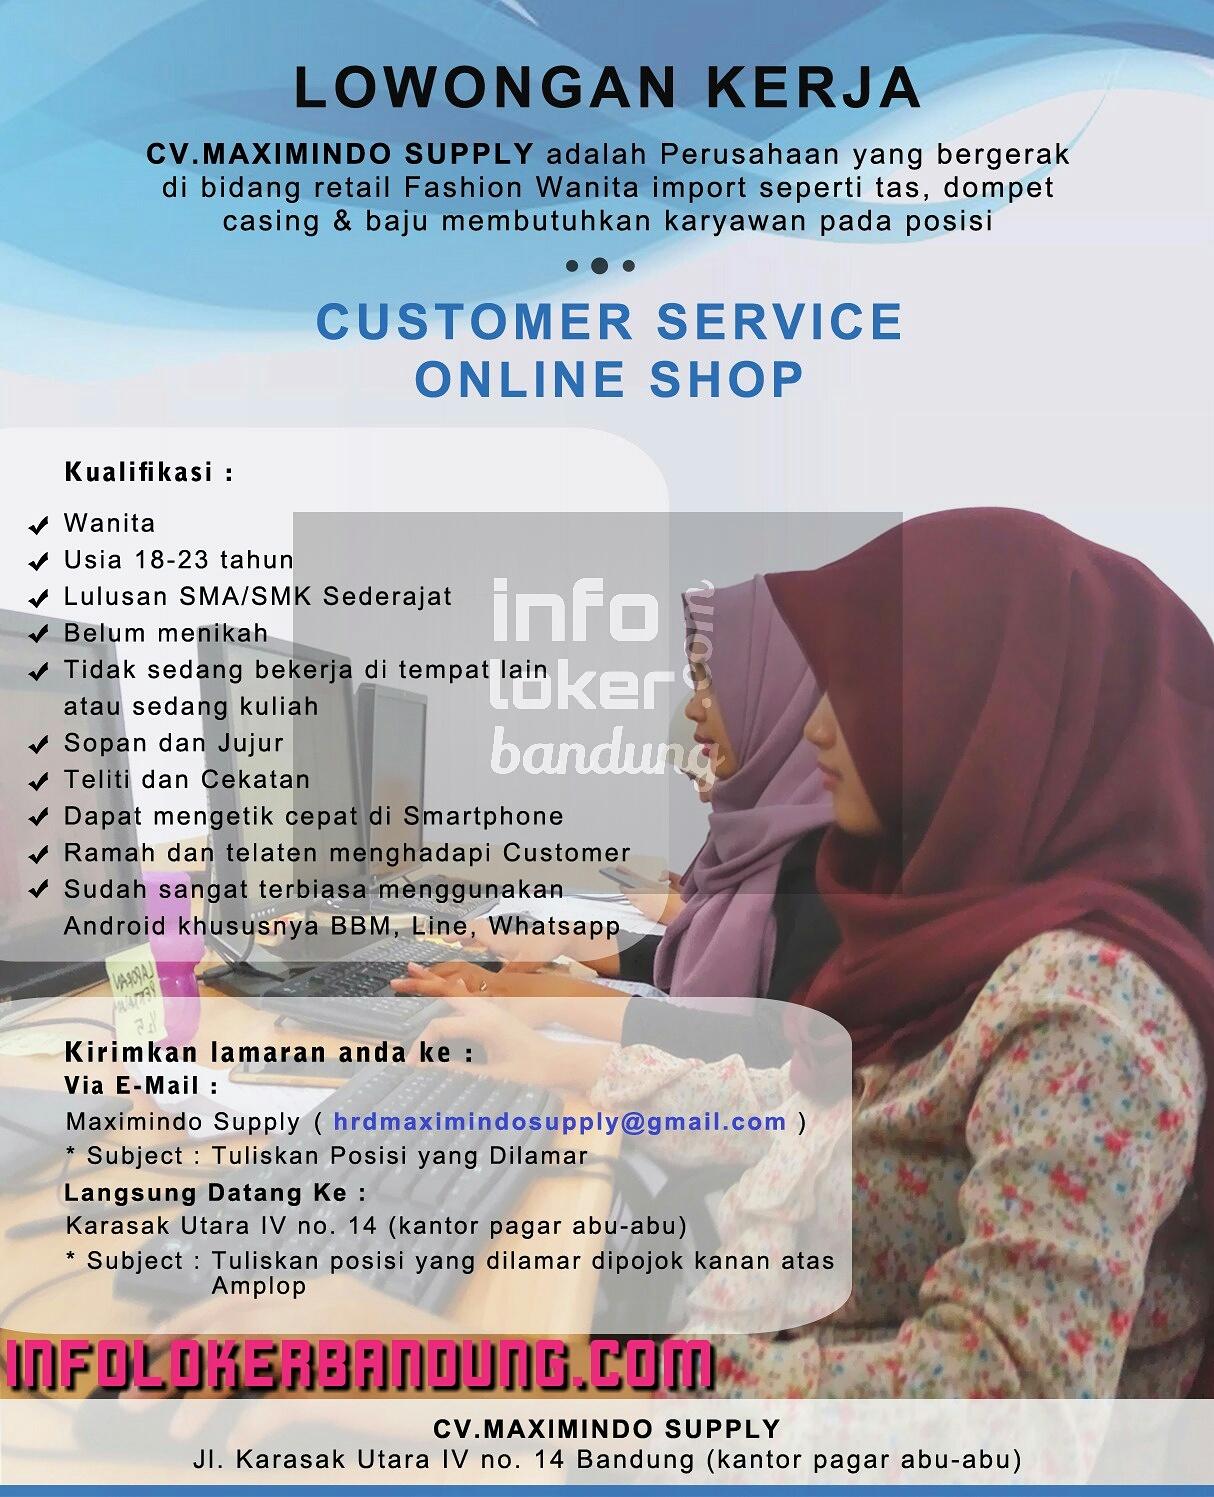 Lowongan Kerja CV. Maximindo Supply Desember 2016